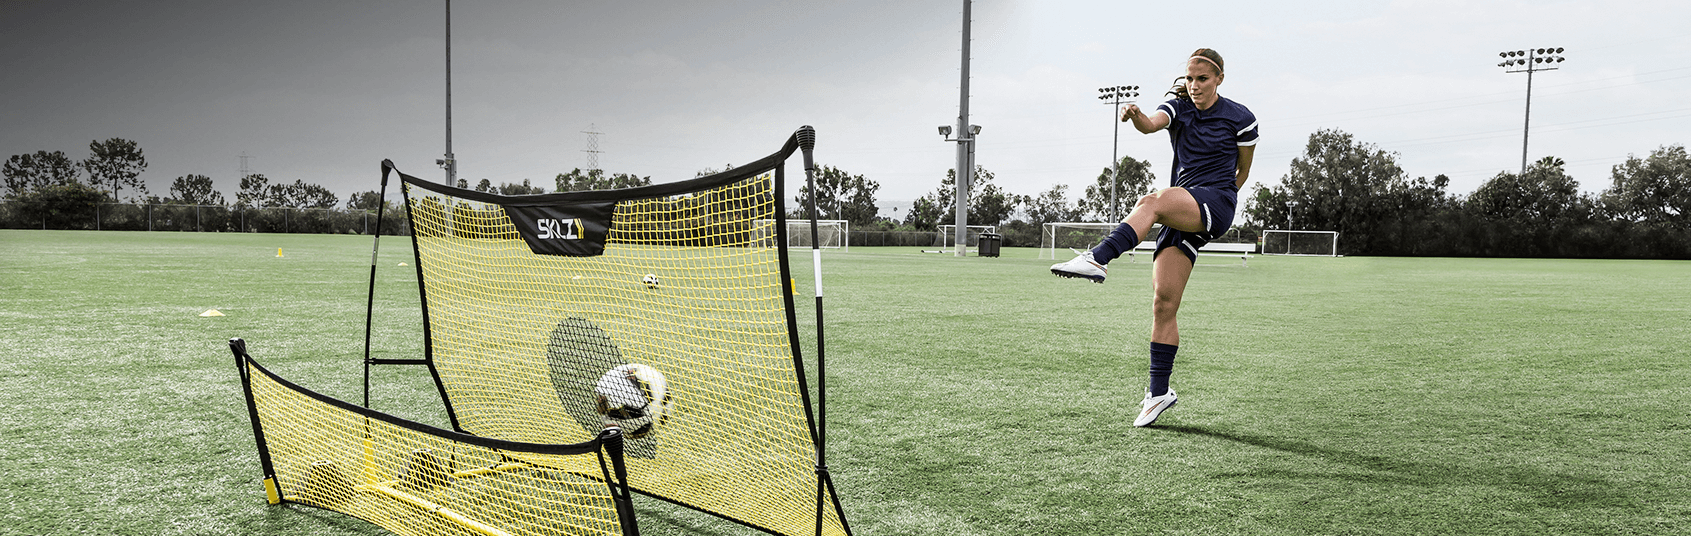 soccer shooting machine